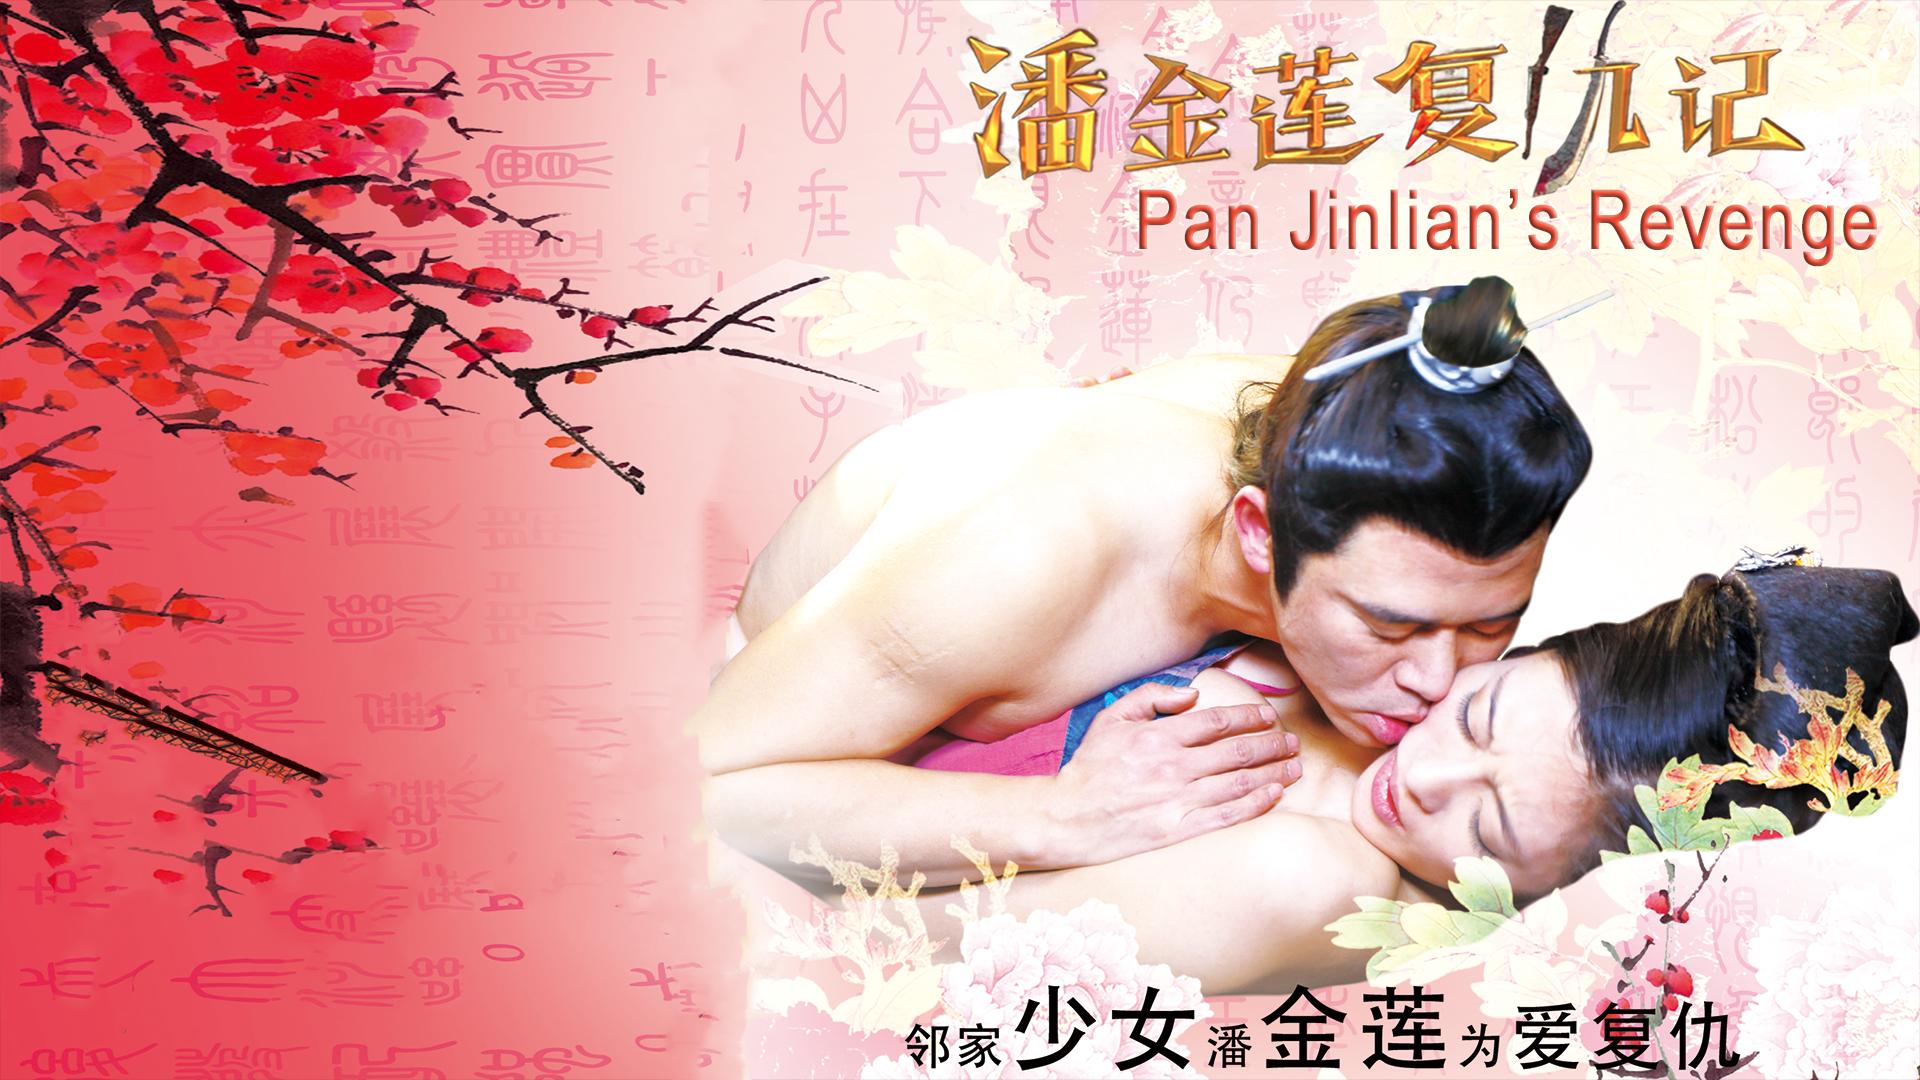 Pan Jinlian's Revenge on Amazon Prime Video UK